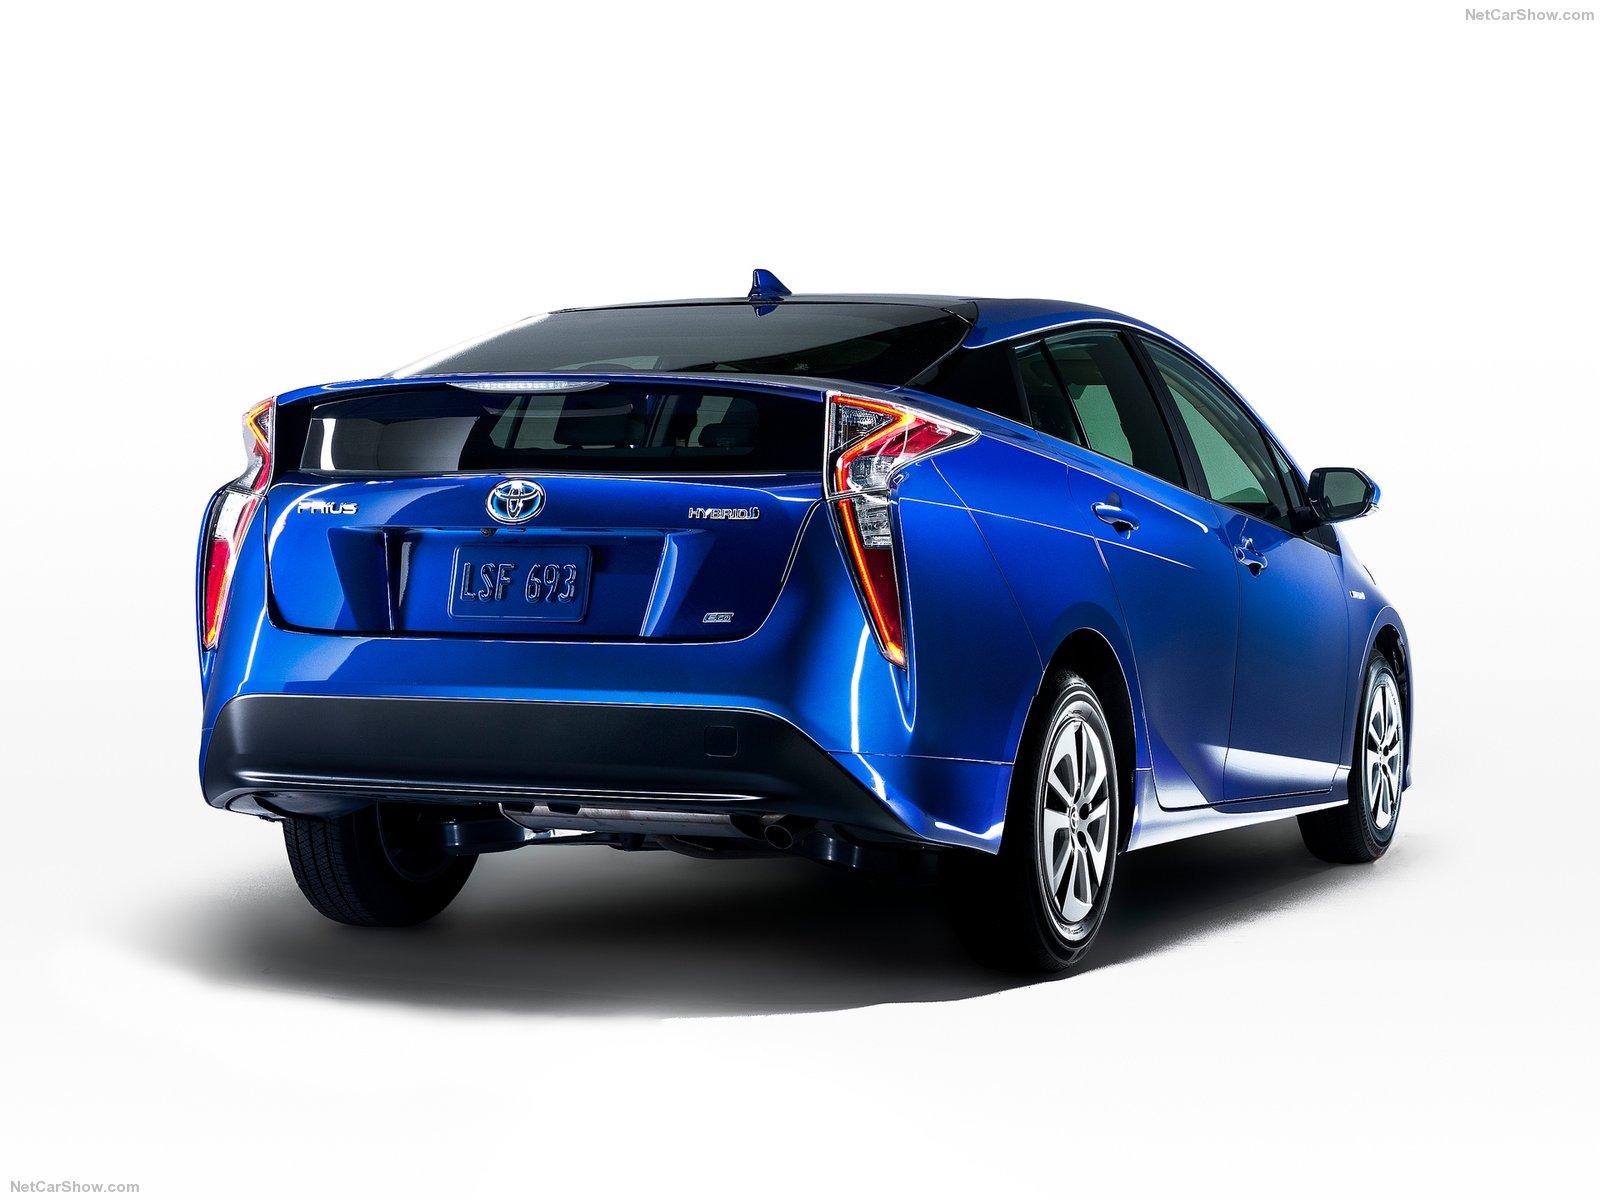 Toyota-Prius_2016_1600x1200_wallpaper_56.jpg